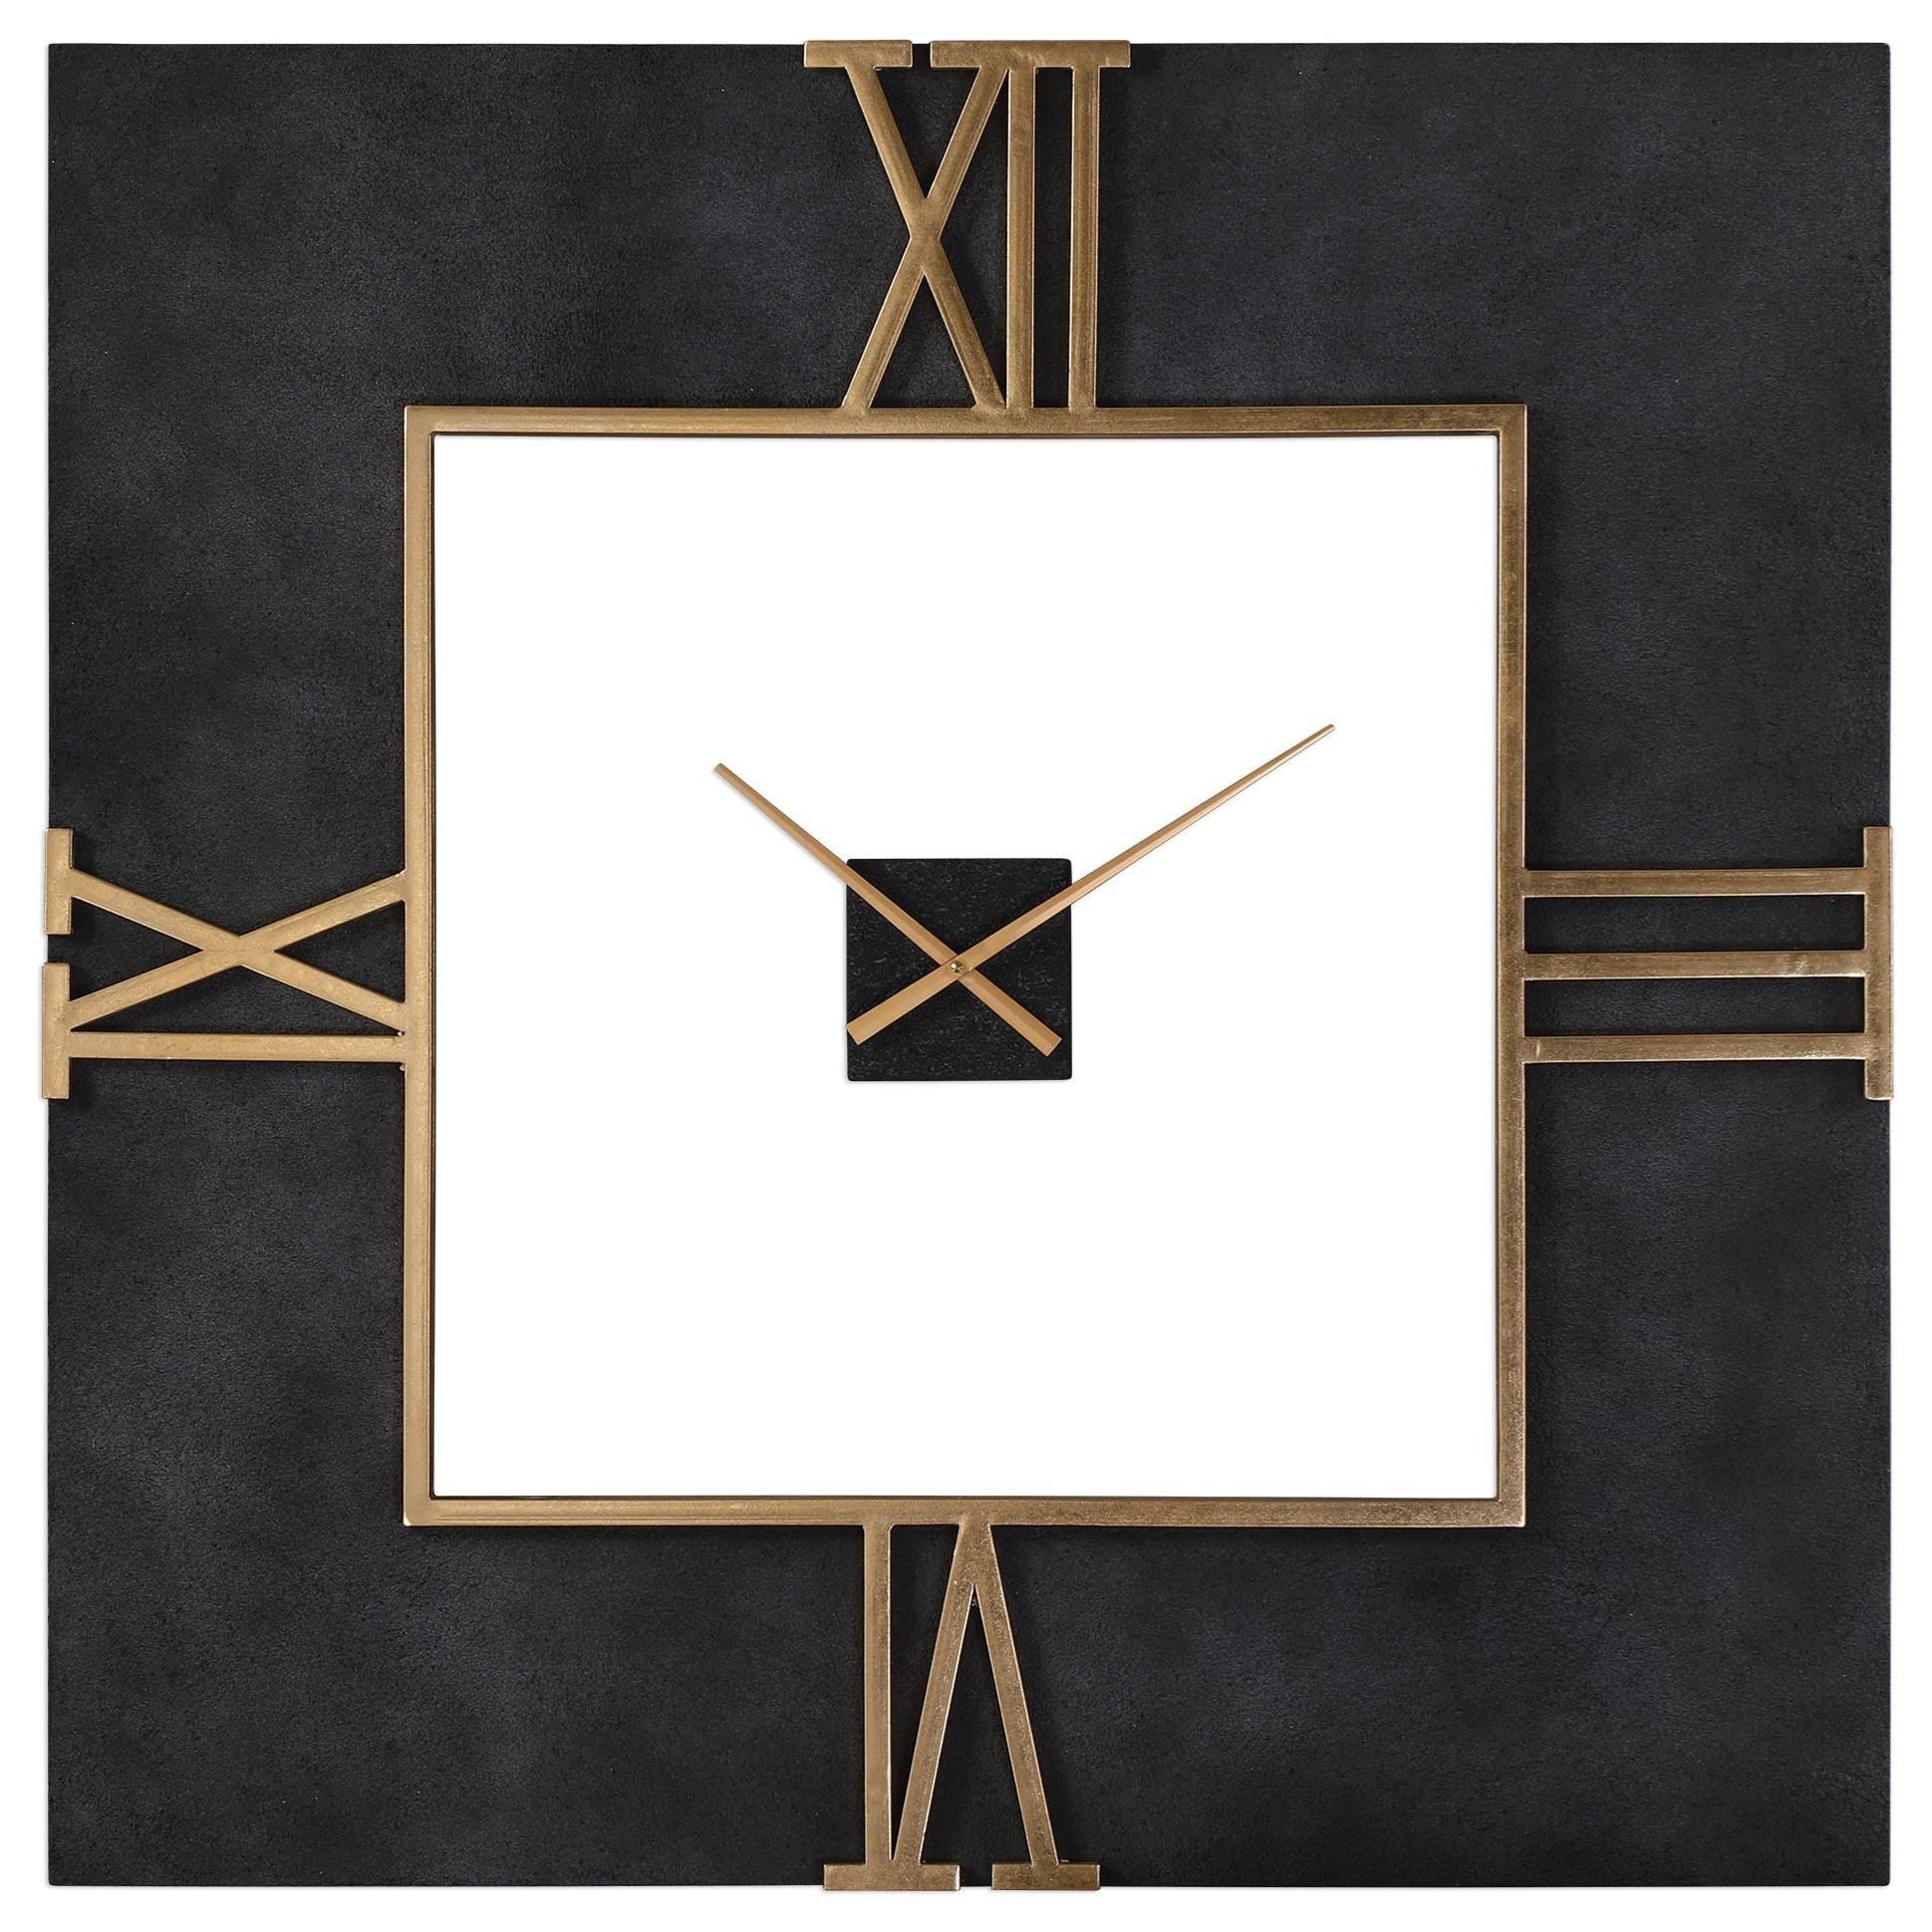 Clocks Uttermost Mudita Square Wall Clock by Uttermost at Mueller Furniture